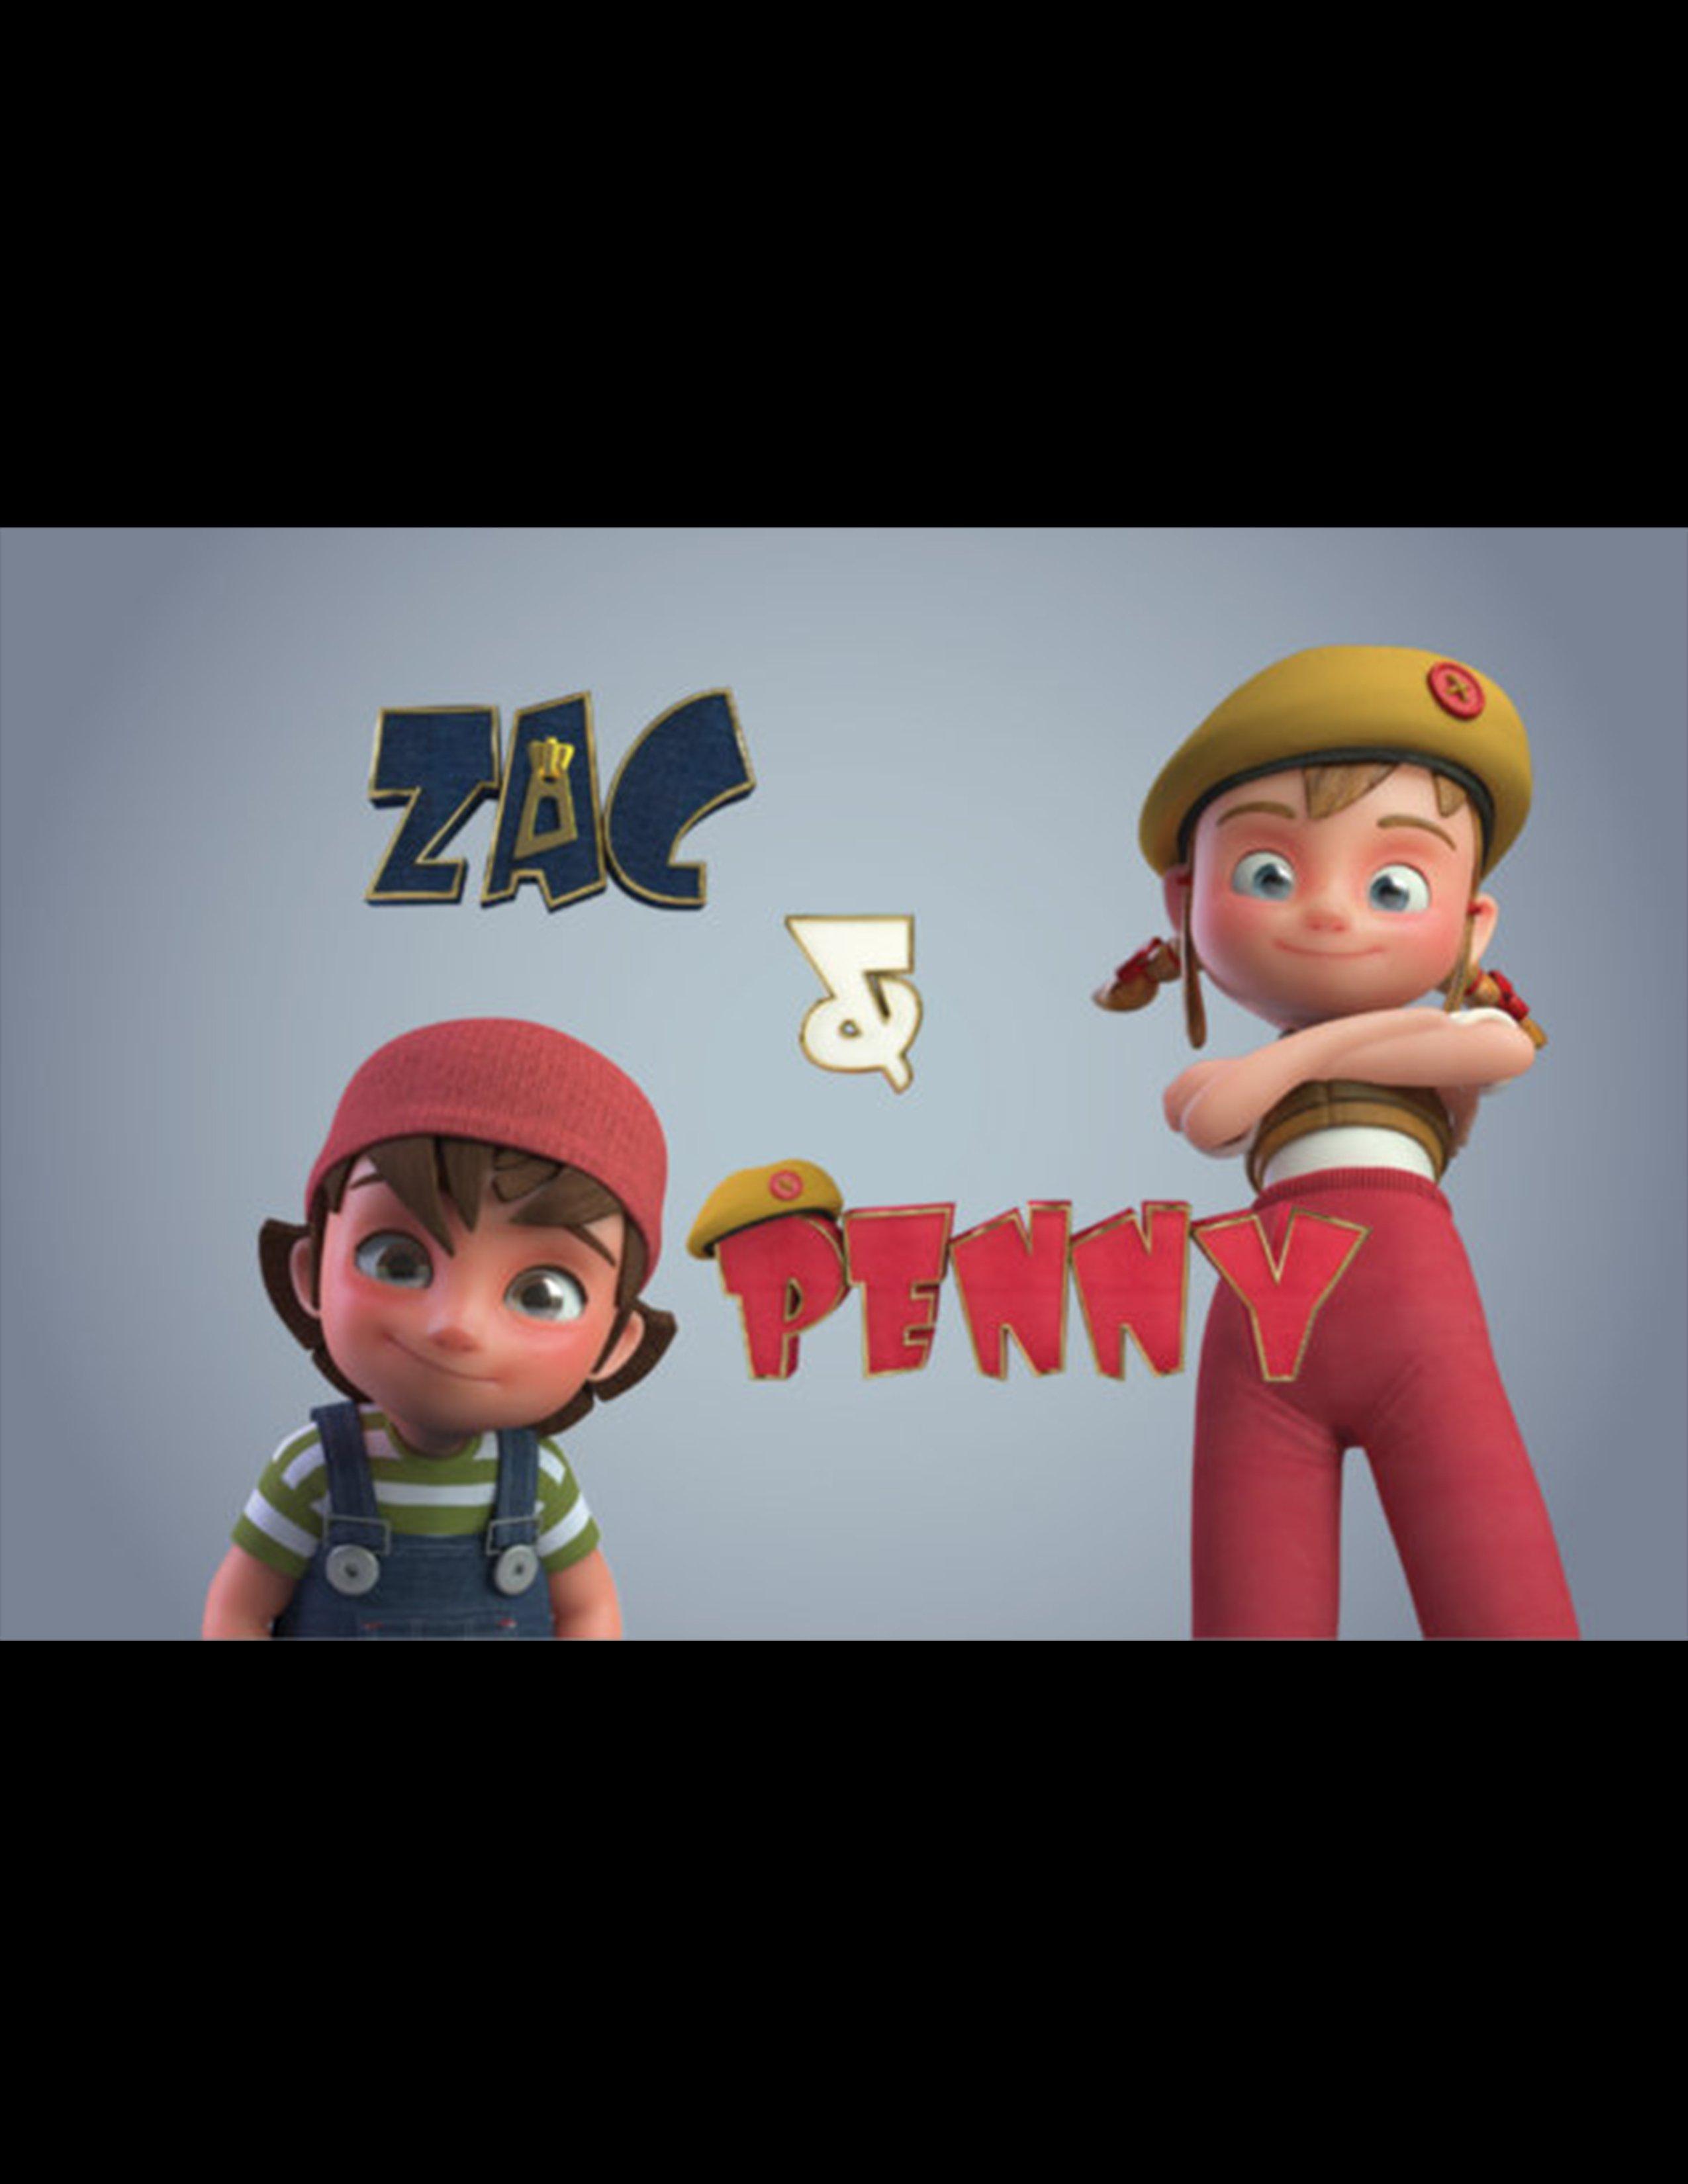 Image Zac & Penny (2012) (TV) Watch Full Movie Free Online